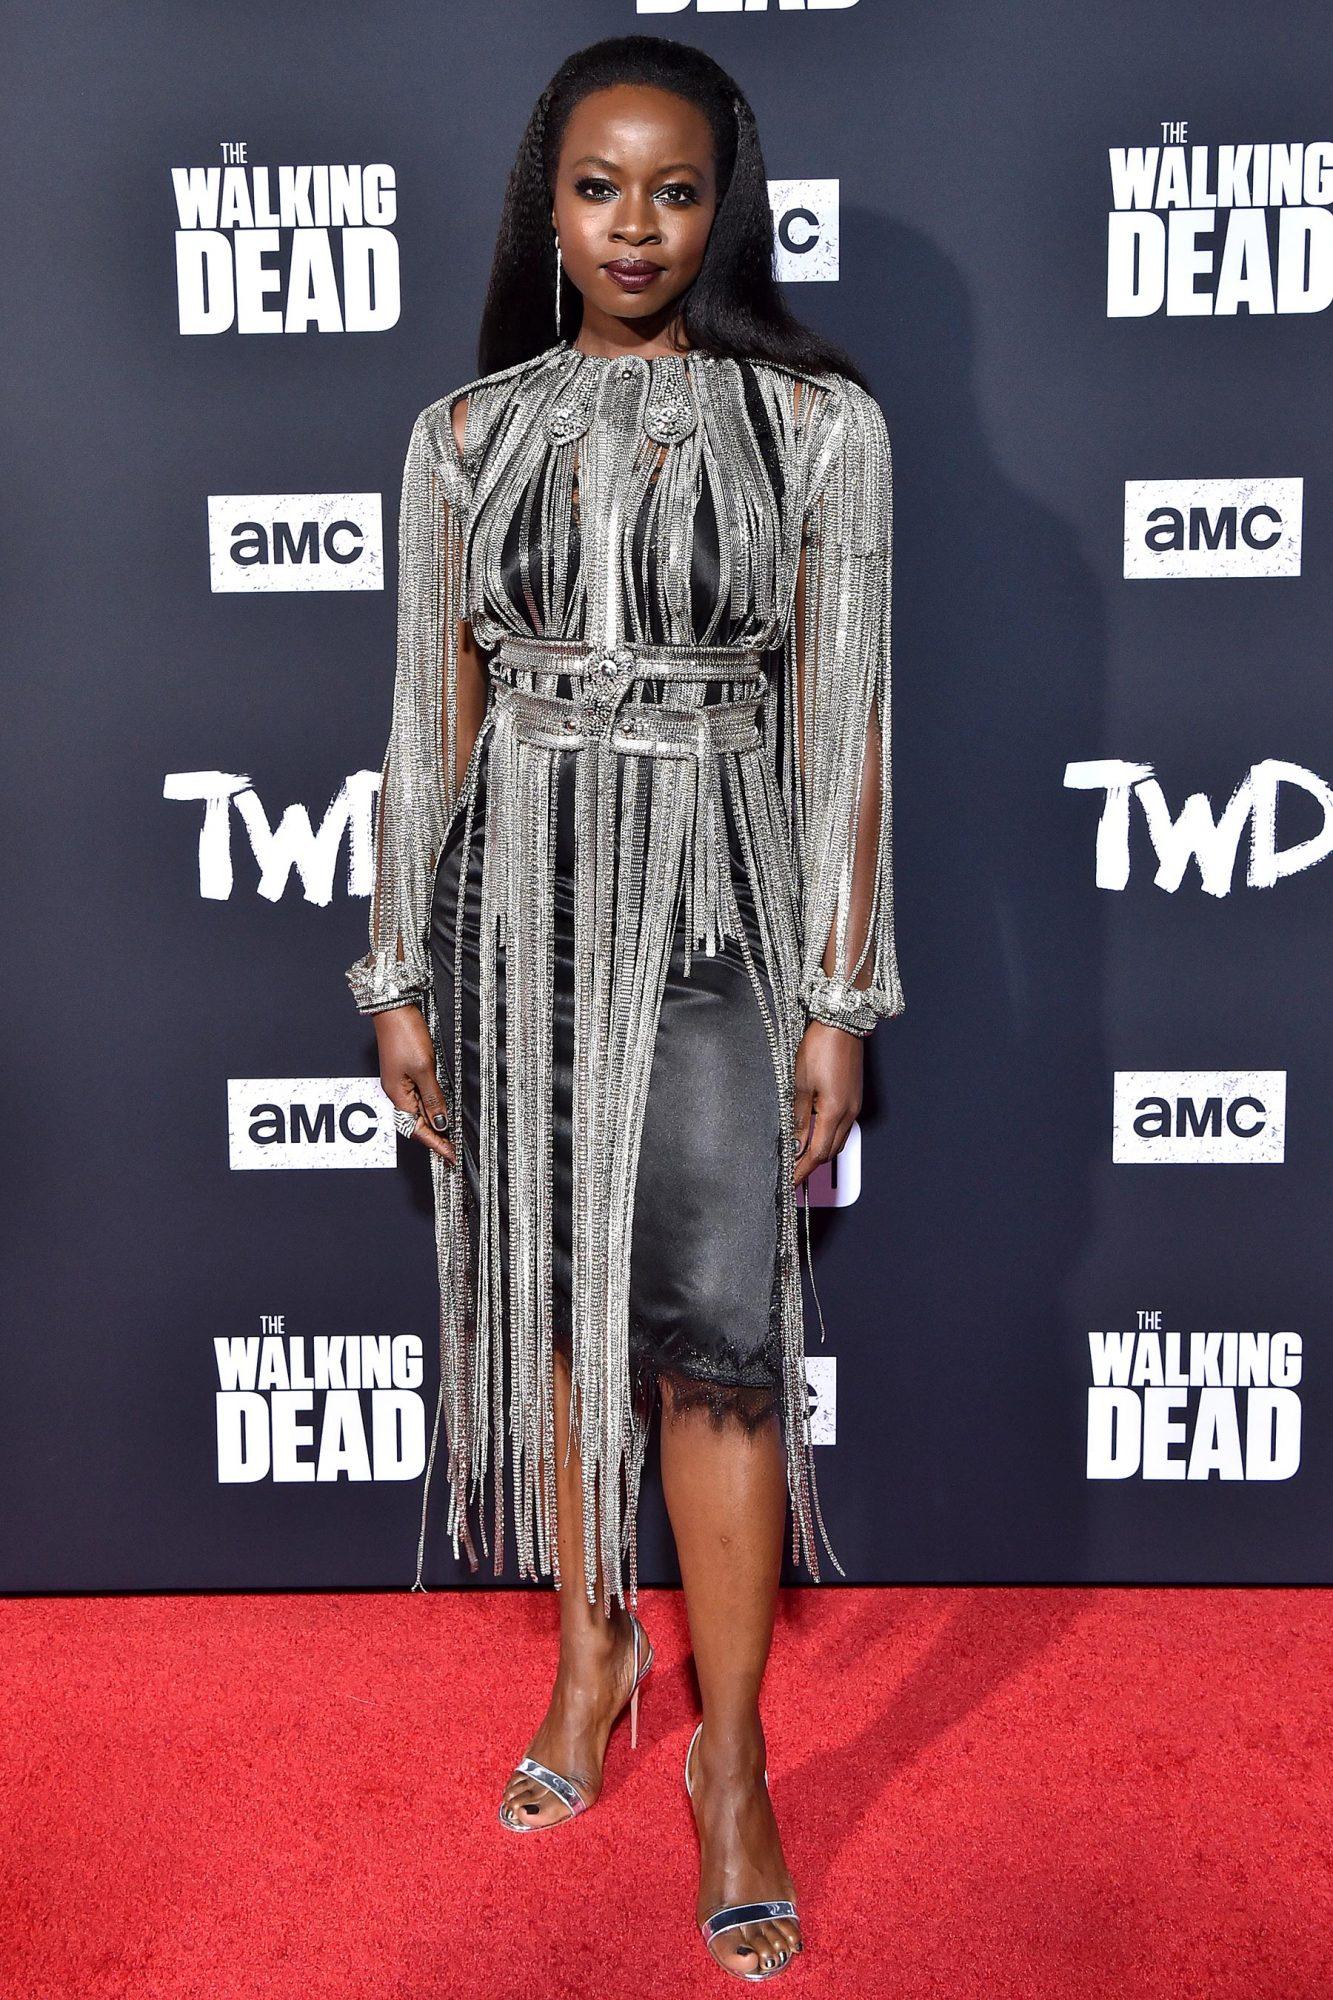 Walking Dead Premiere - Danai Gurira